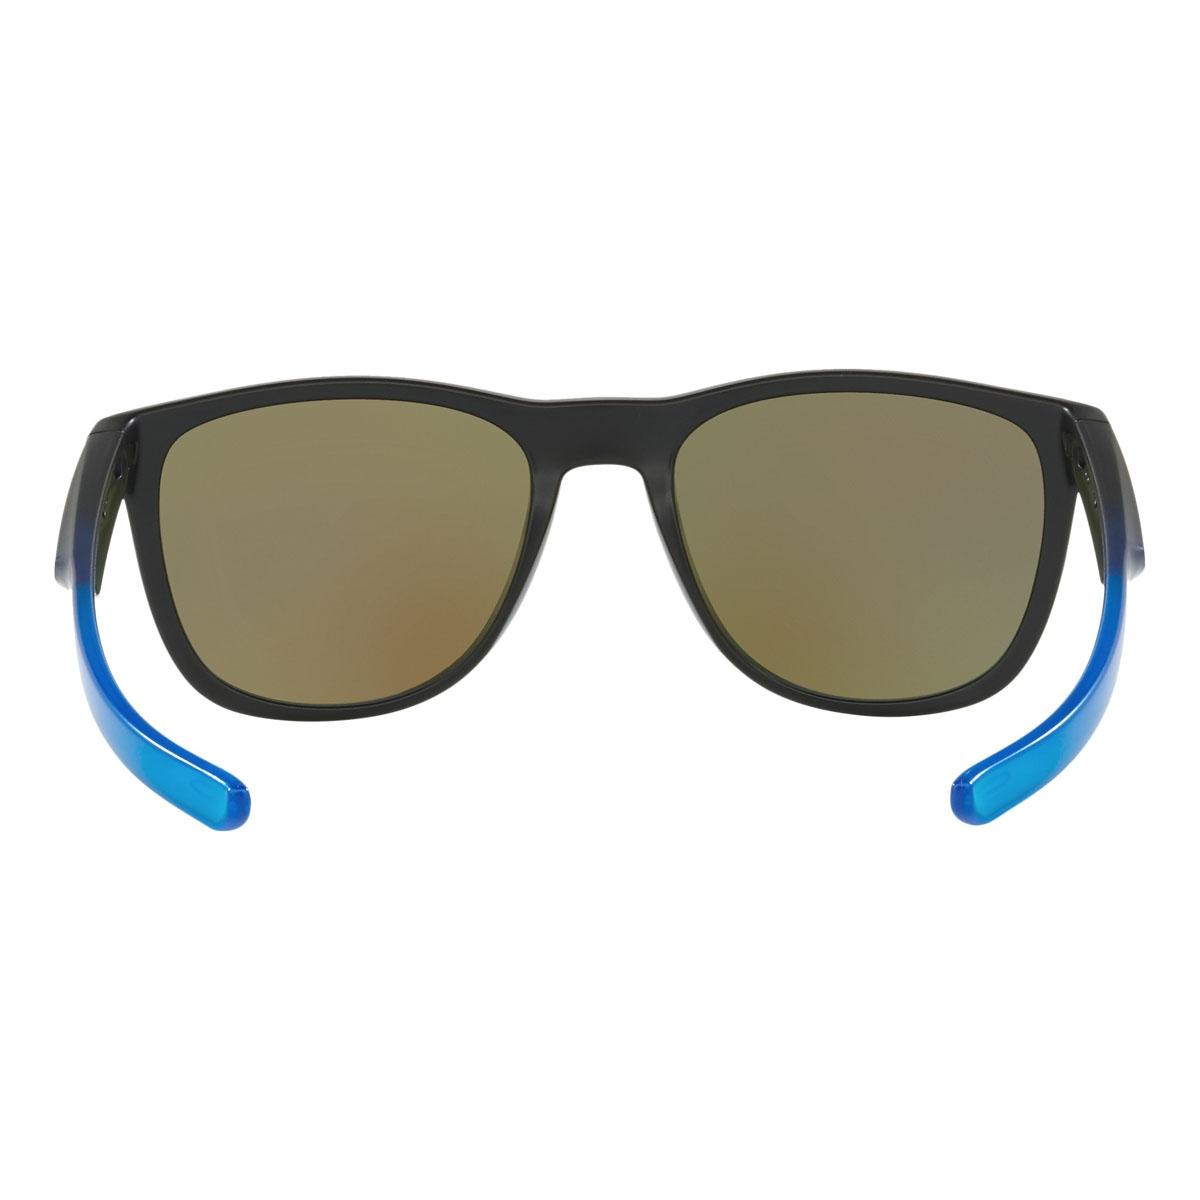 801629fd96 ... Image of Oakley Trillbe X Prizm Polarised Sunglasses - Sapphire Fade  Frame Prizm Sapphire Polarized ...